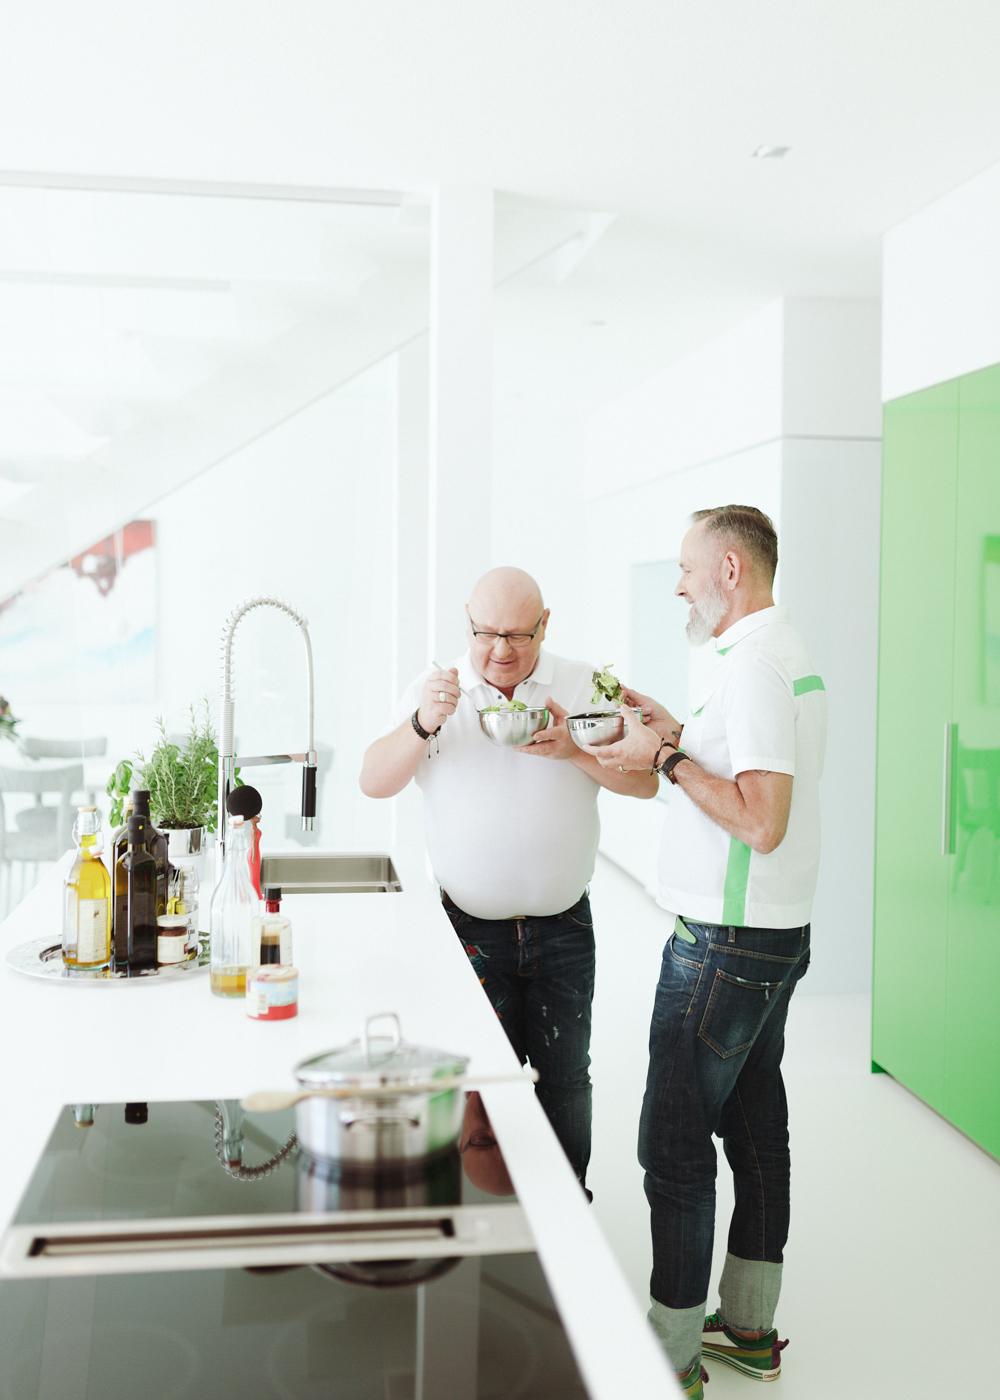 plan 3 kuchyně / Квартира дизайнера / Кухня с характером скульптуры